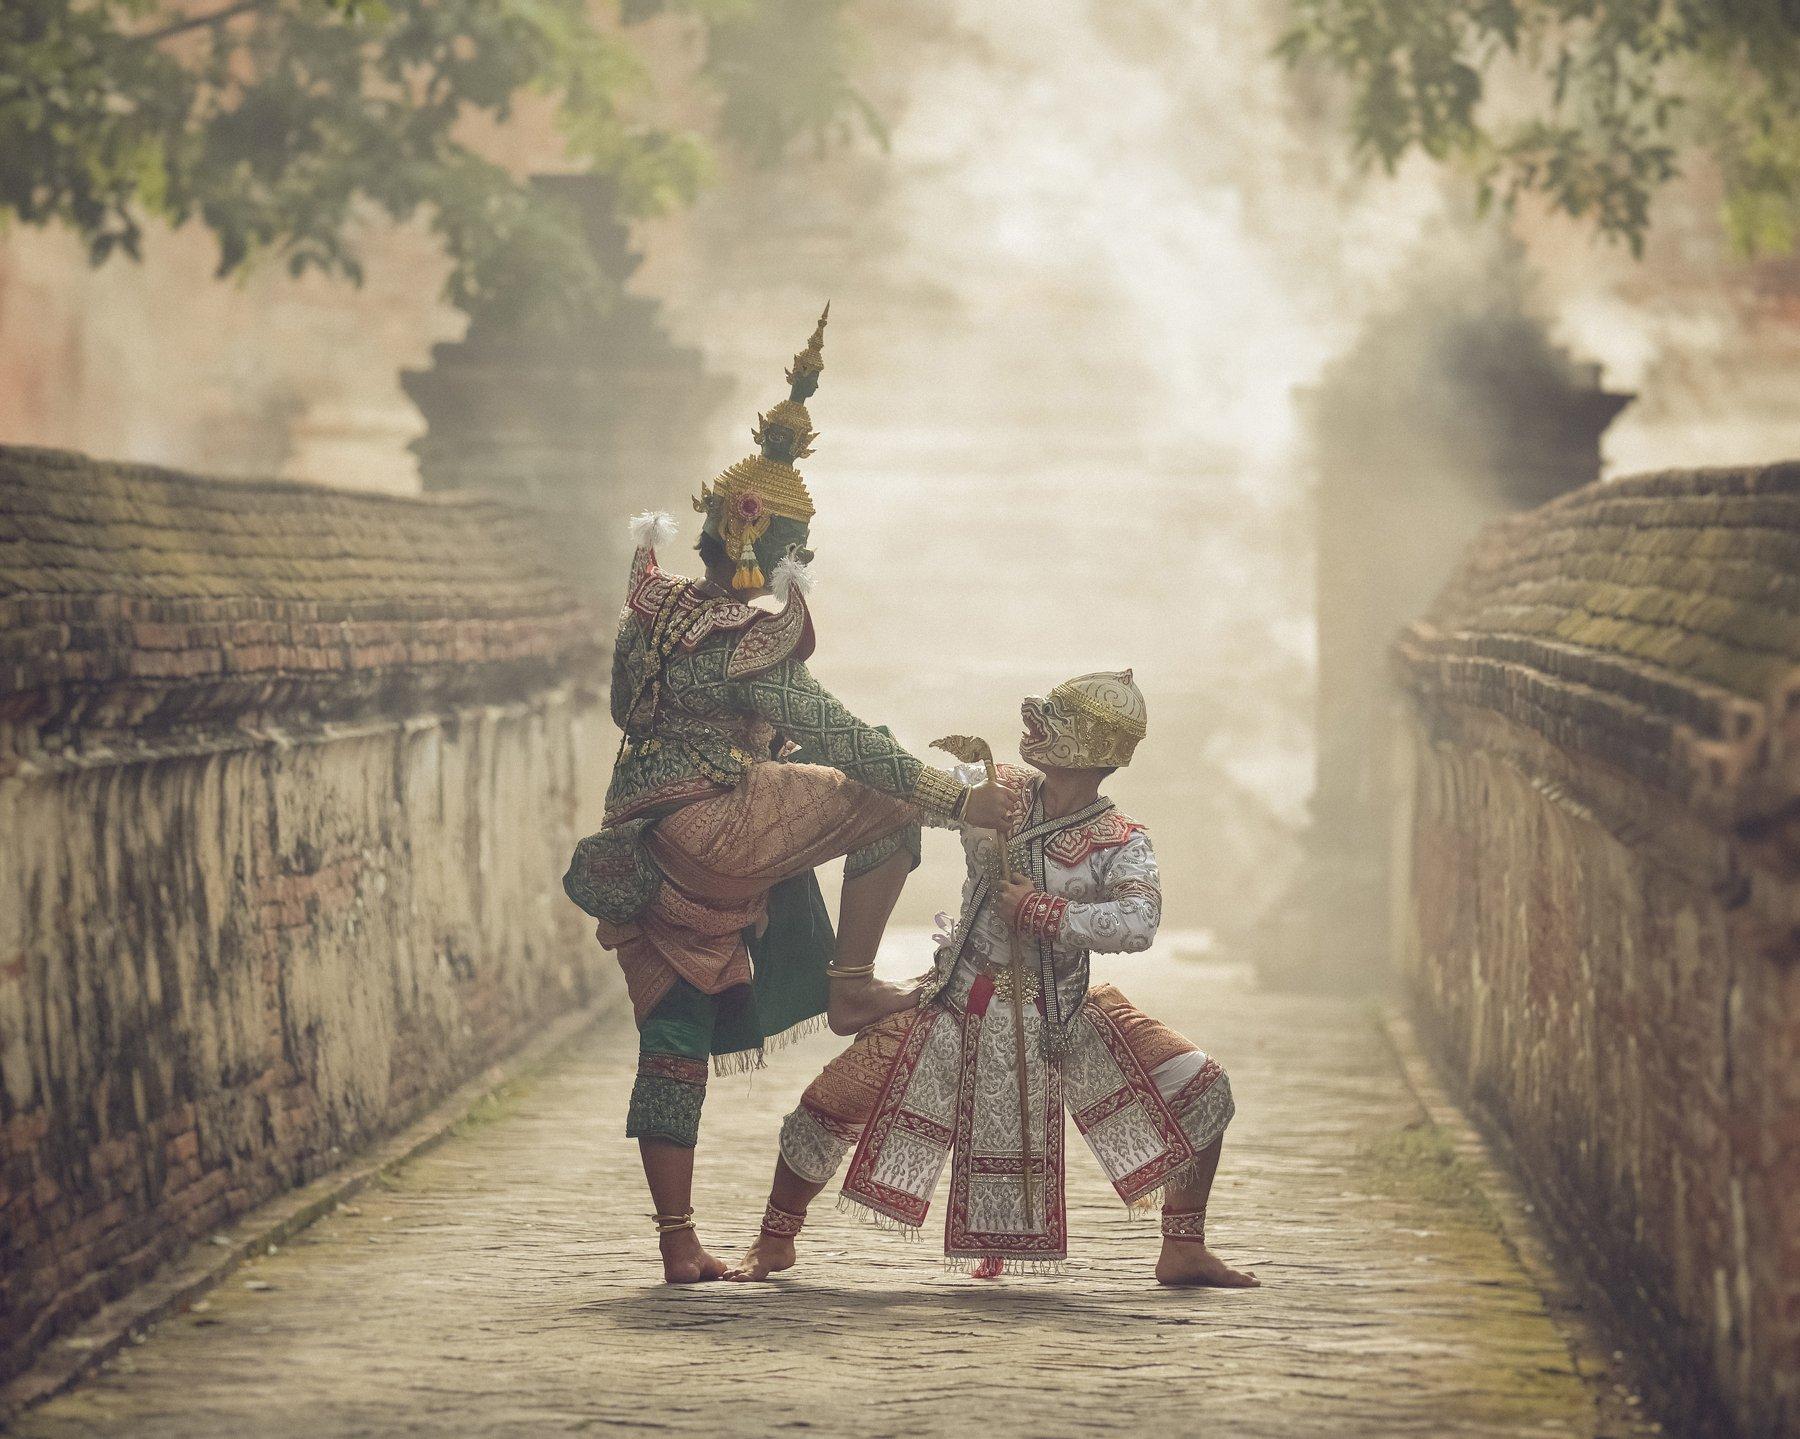 tmeple,culture,thai, thailand, ADIREK M